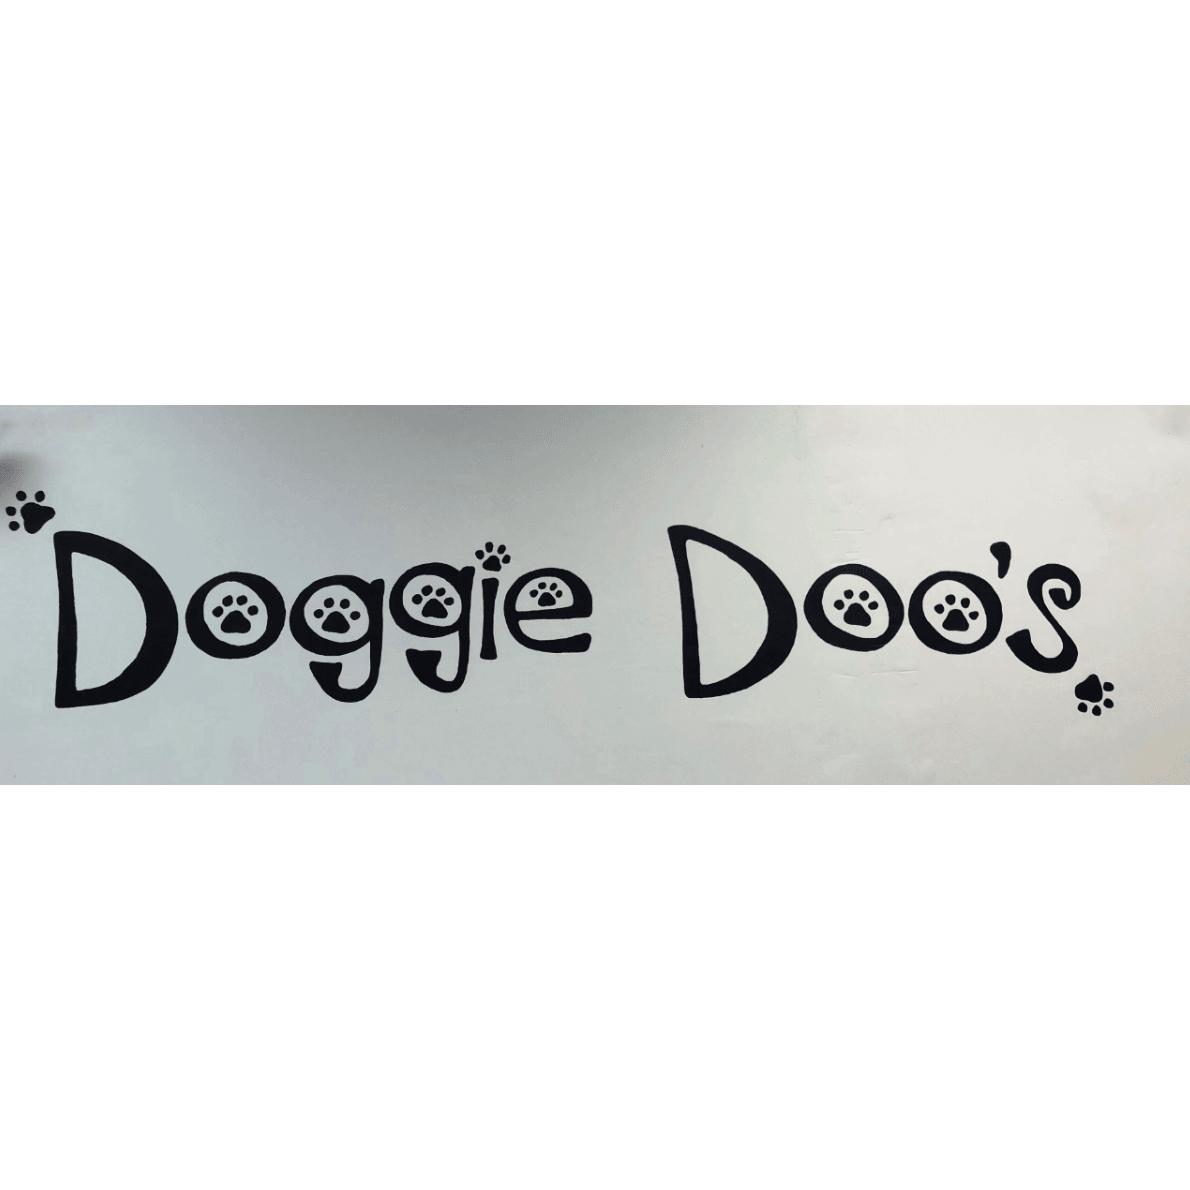 Doggie Doo's Dog Grooming